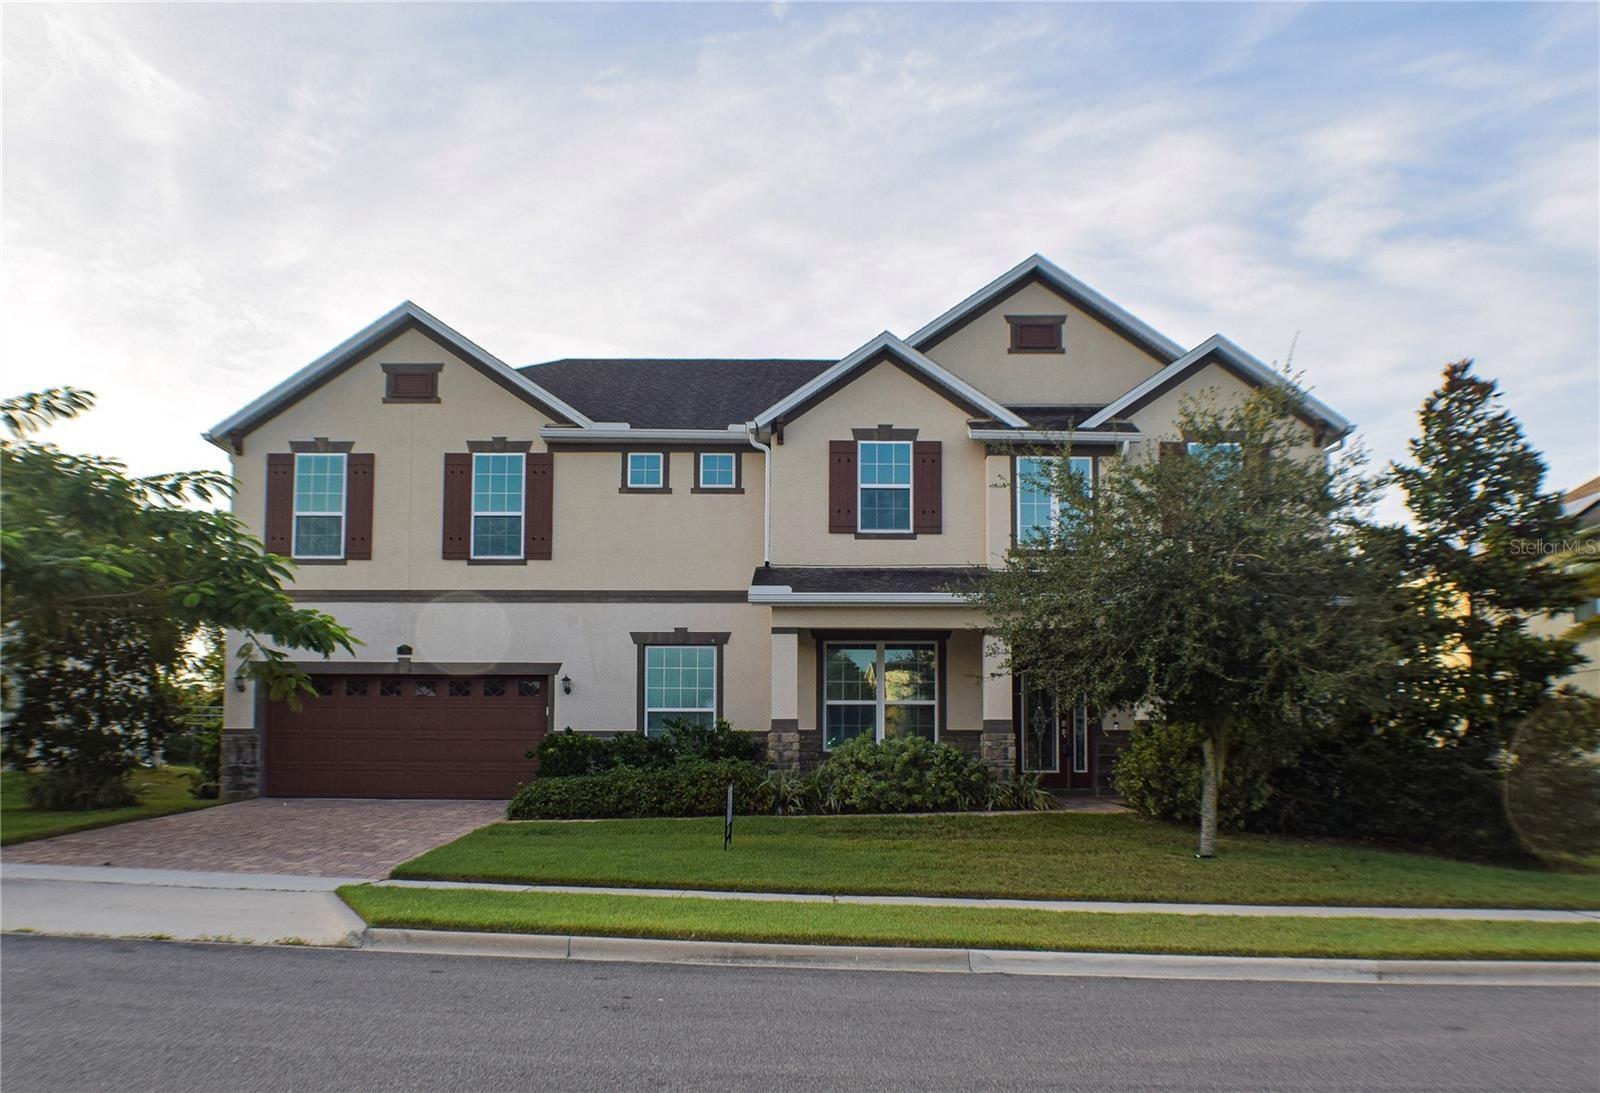 17985 GOURD NECK LOOP, Winter Garden, FL 34787 - MLS#: O5974617